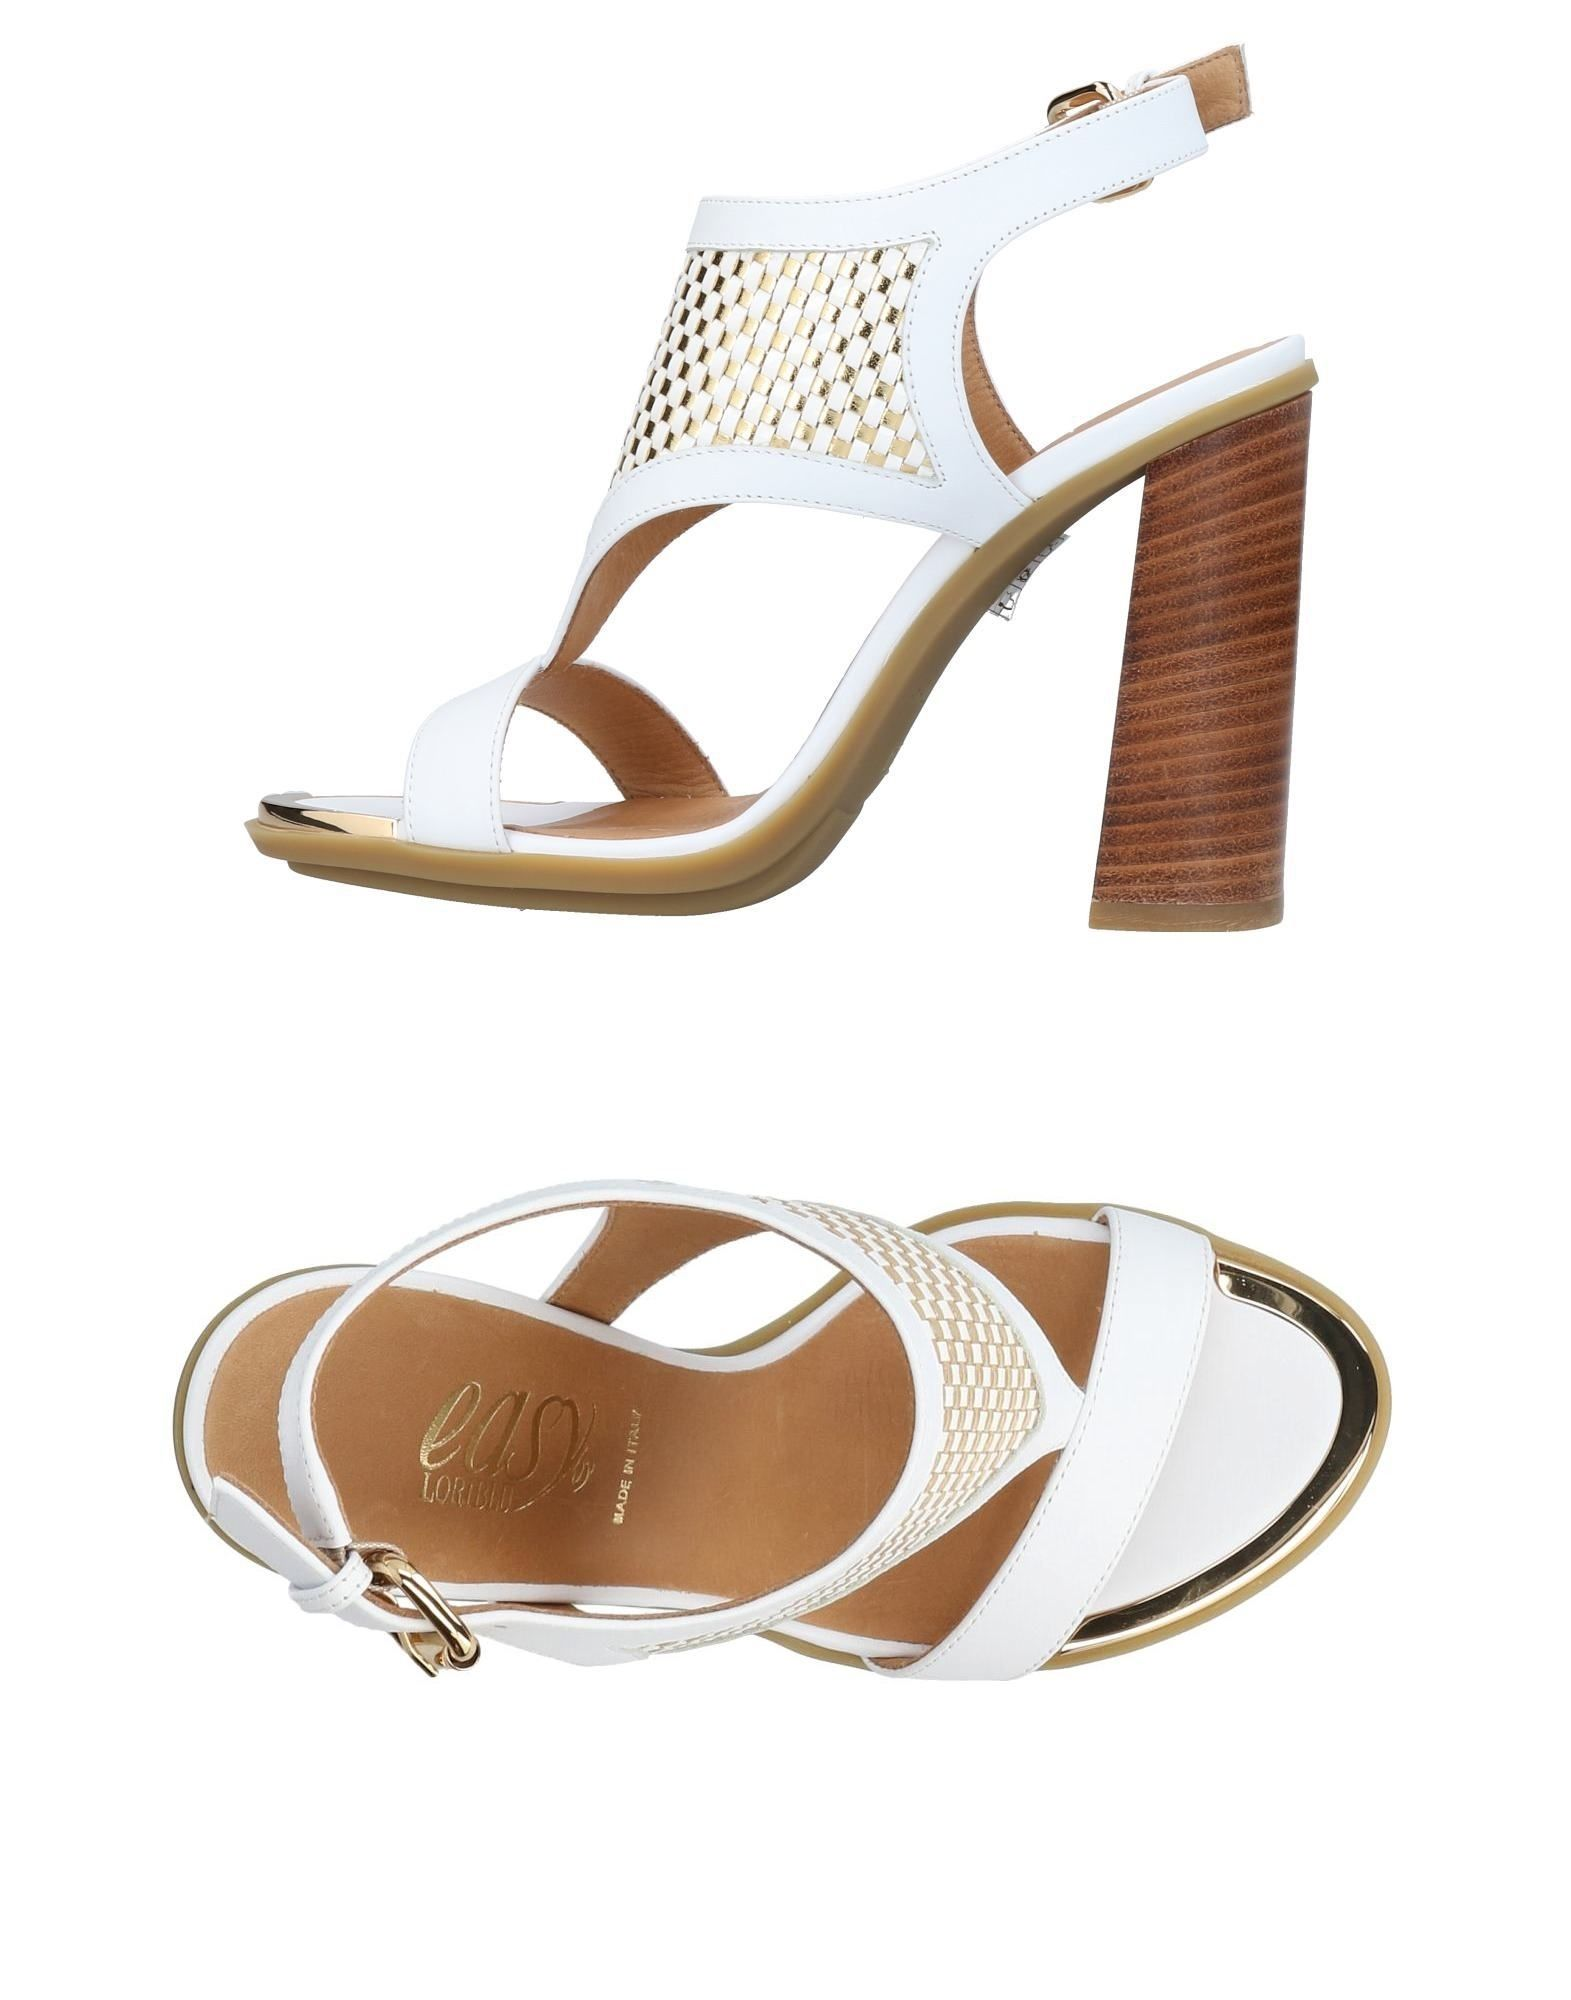 Loriblu Sandalen Damen  11423391UR Gute Qualität beliebte Schuhe